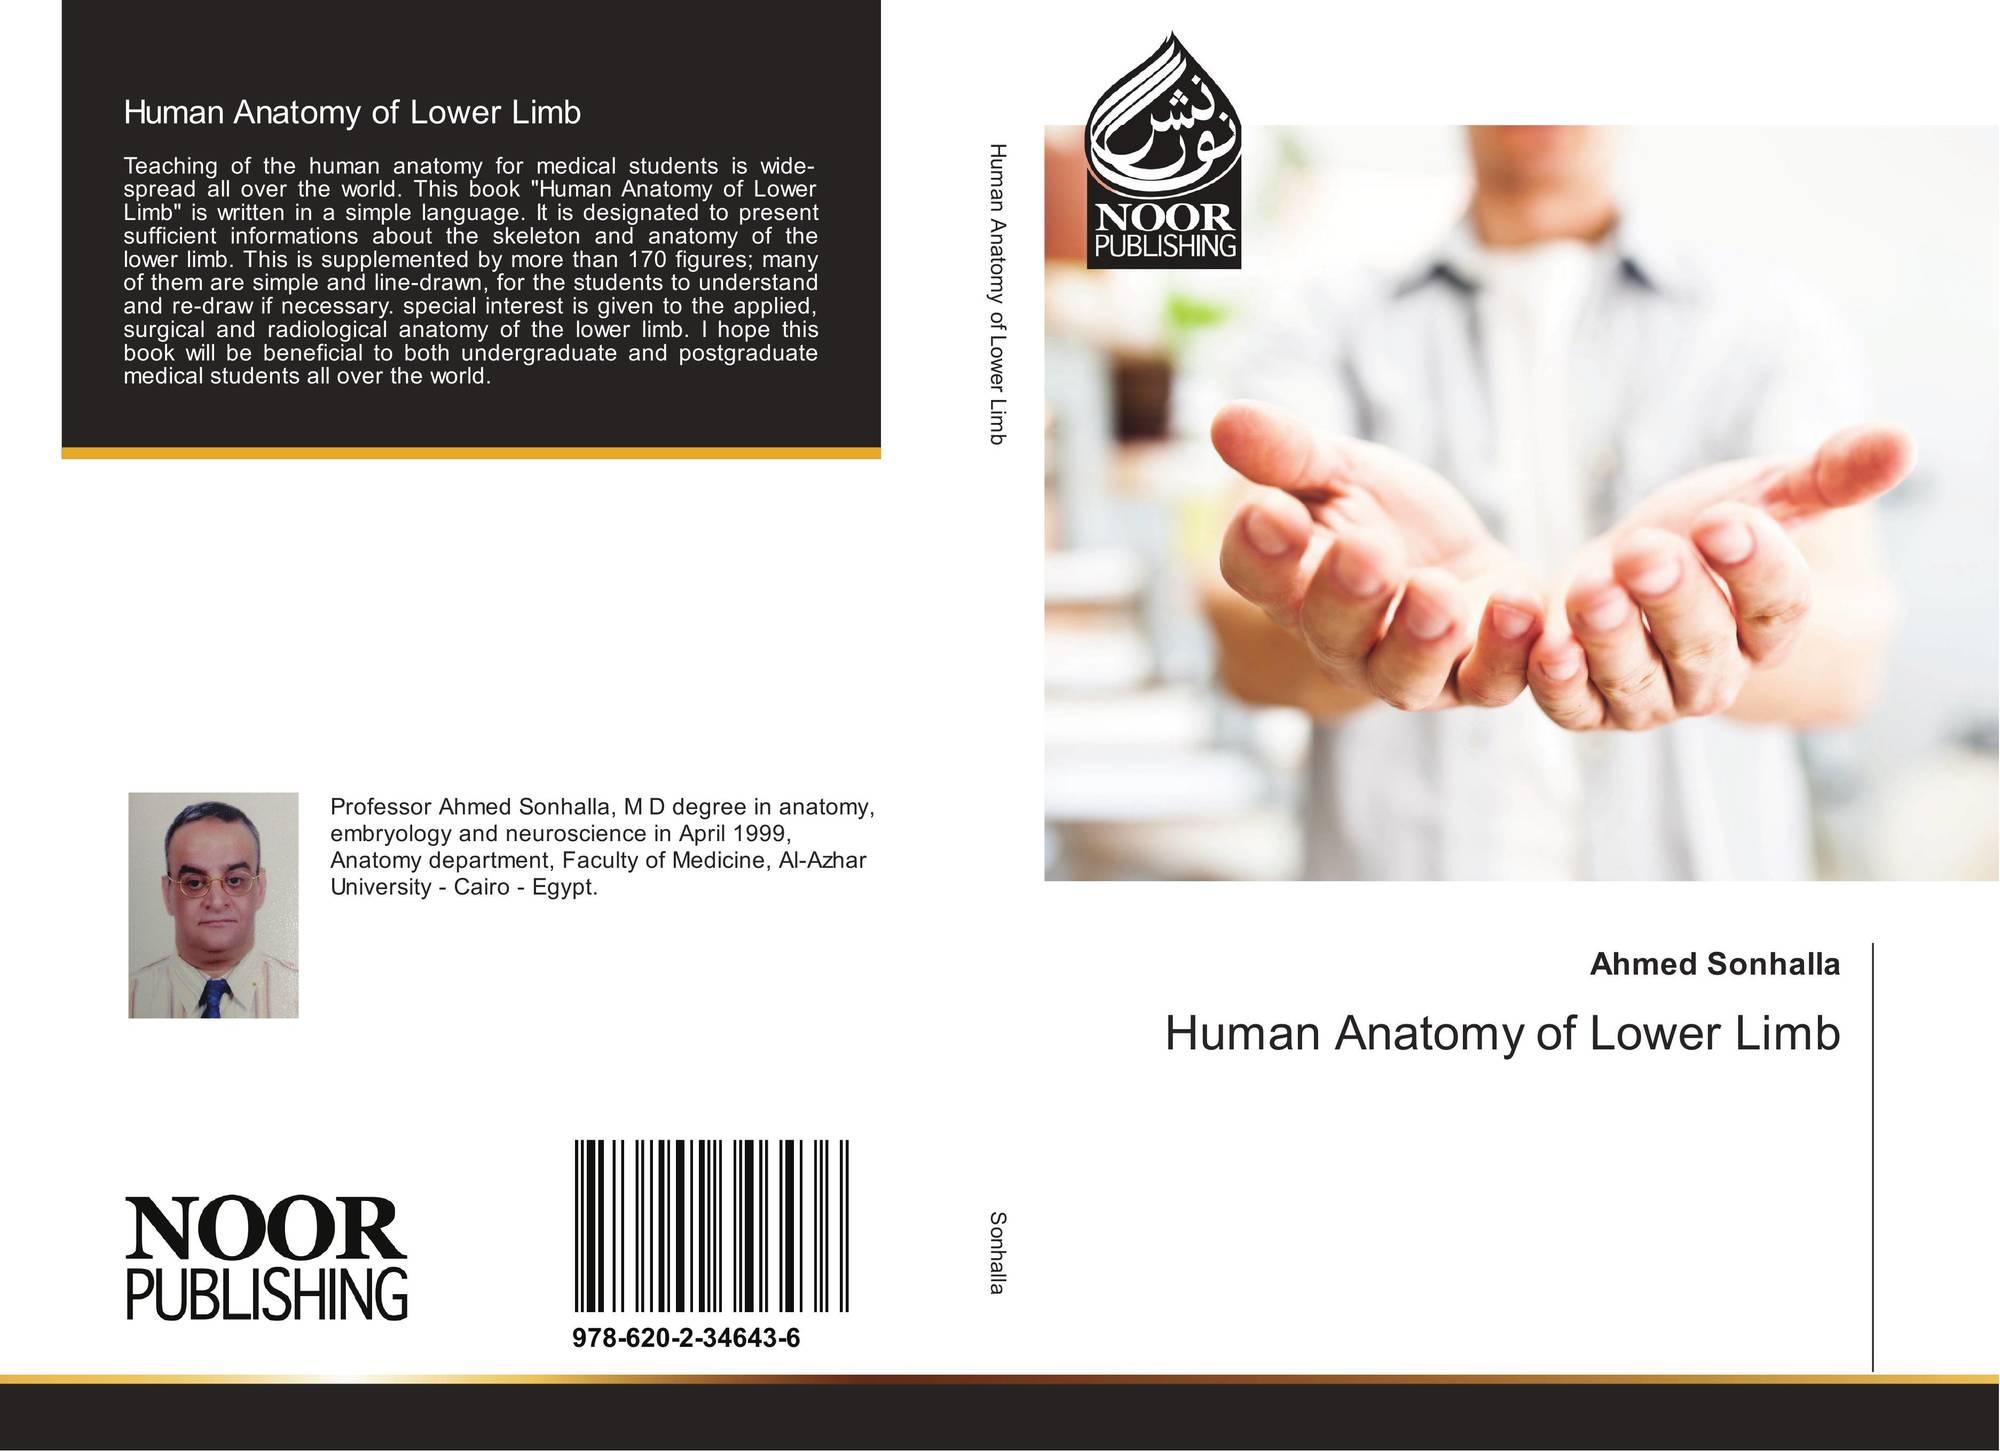 Human Anatomy of Lower Limb, 978-620-2-34643-6, 6202346434 ...